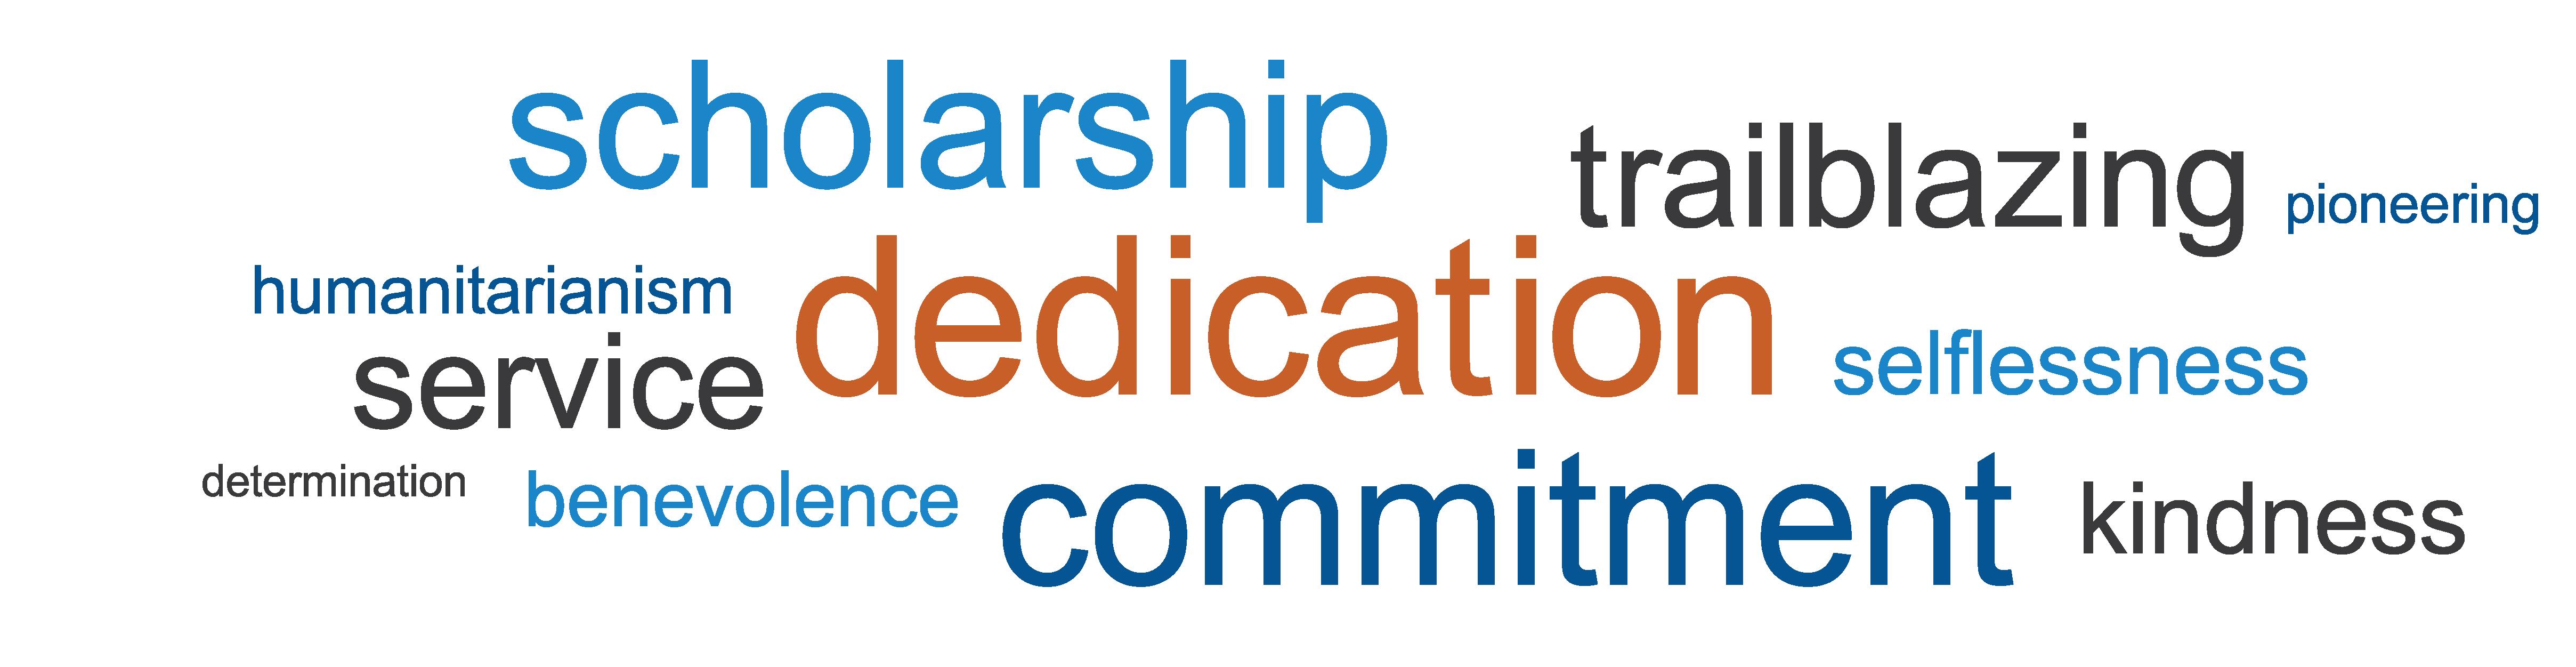 Leadership traits - dedication, commitment, scholarship, trailblazing, service, kindness, selflessness, humanitarianism, benevolence, pioneering, determination